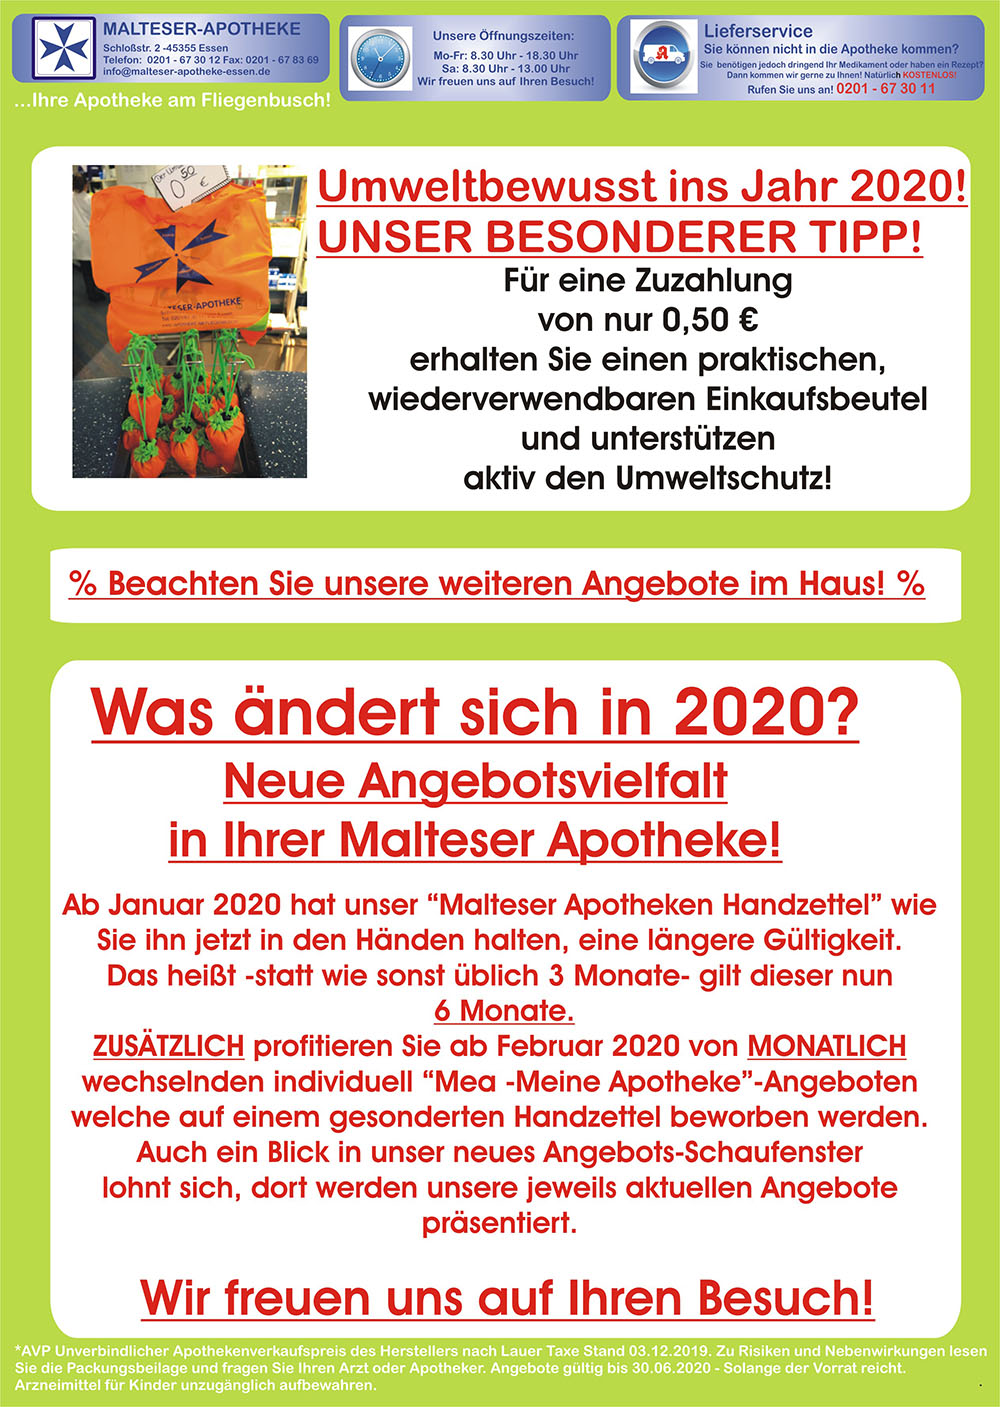 http://www.apotheken.de/fileadmin/clubarea/00000-Angebote/45355_malteser_angebot_1.jpg